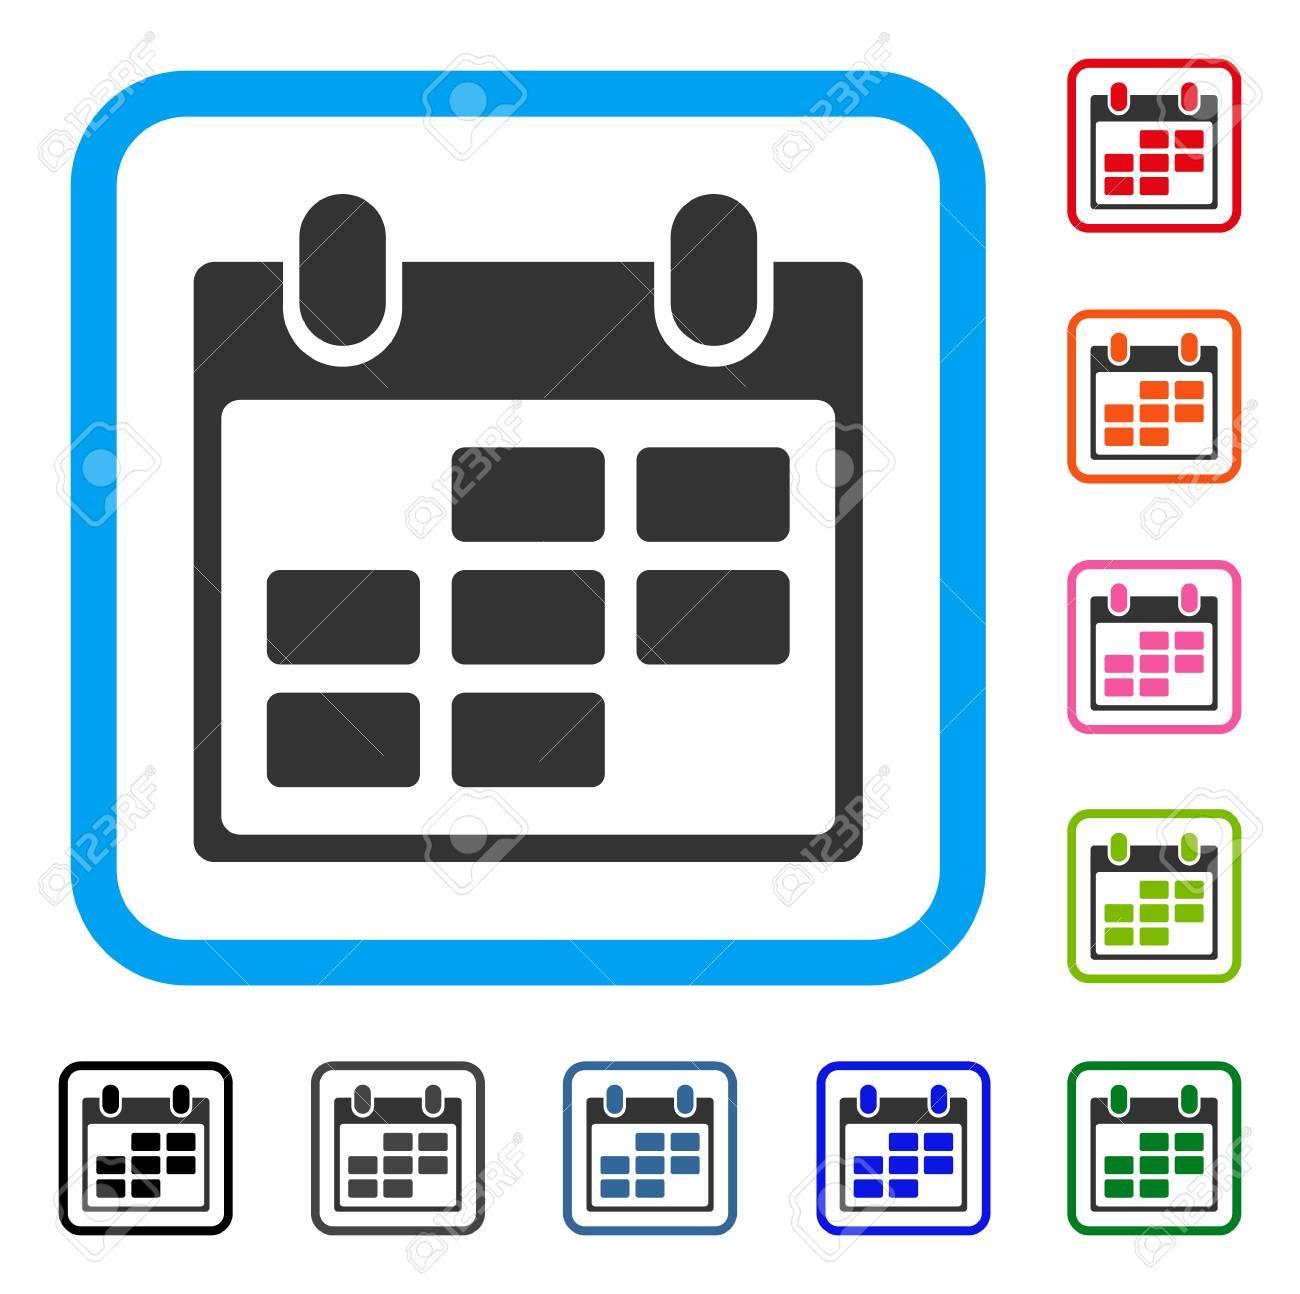 Calendar Icon. Flat Grey Pictogram Symbol Inside A Light Blue.. regarding Calendar Icon Grey